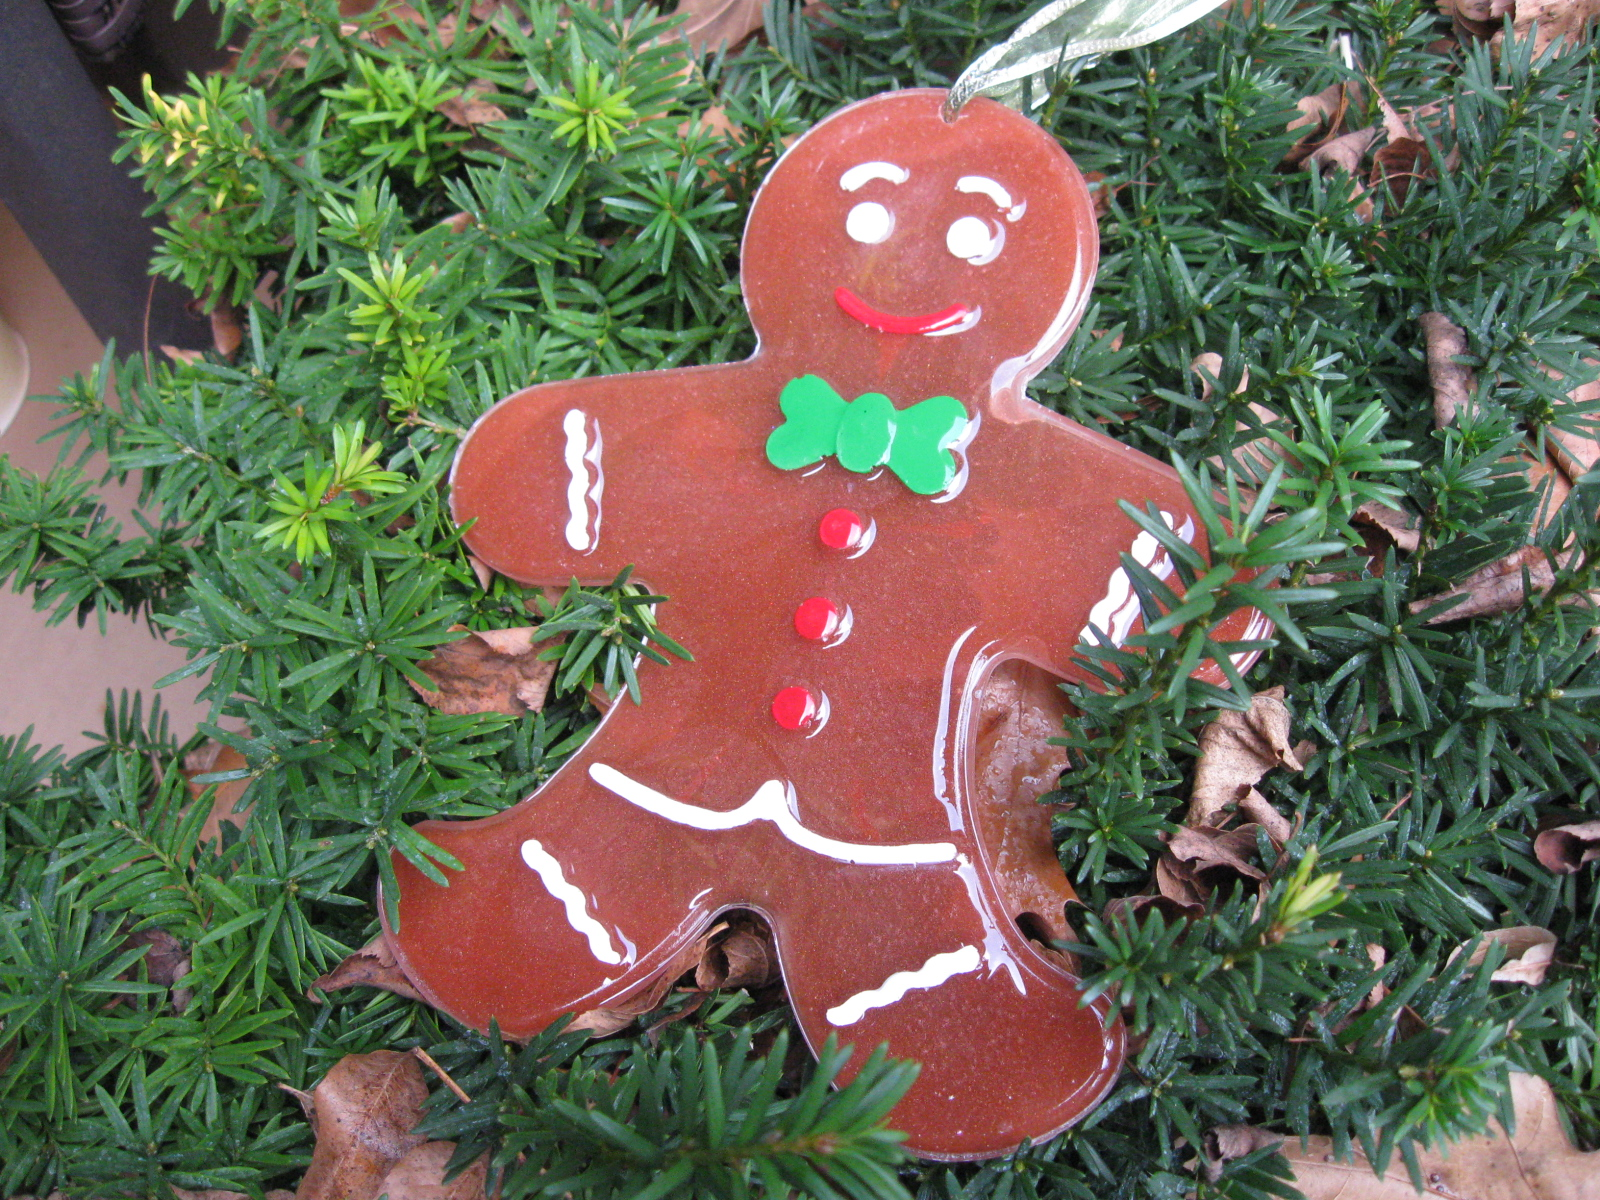 Craft klatch big resin gingerbread man christmas decoration craft tutorial - Decorations for gingerbread man ...